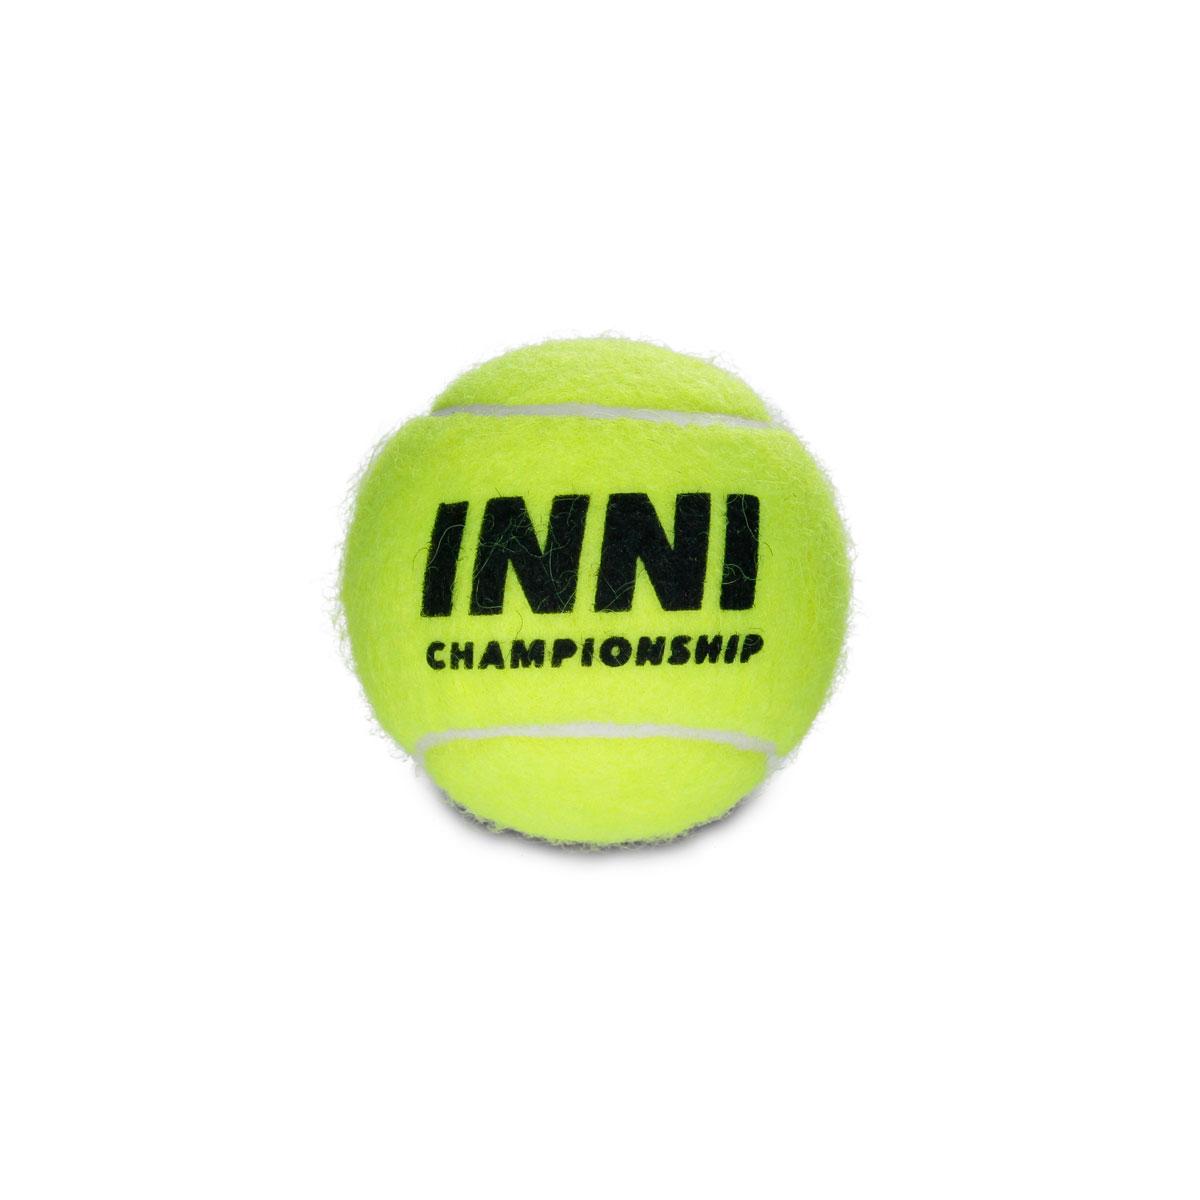 Bola De Tênis Inni Championship - 1 Tubo de 3 Bolas